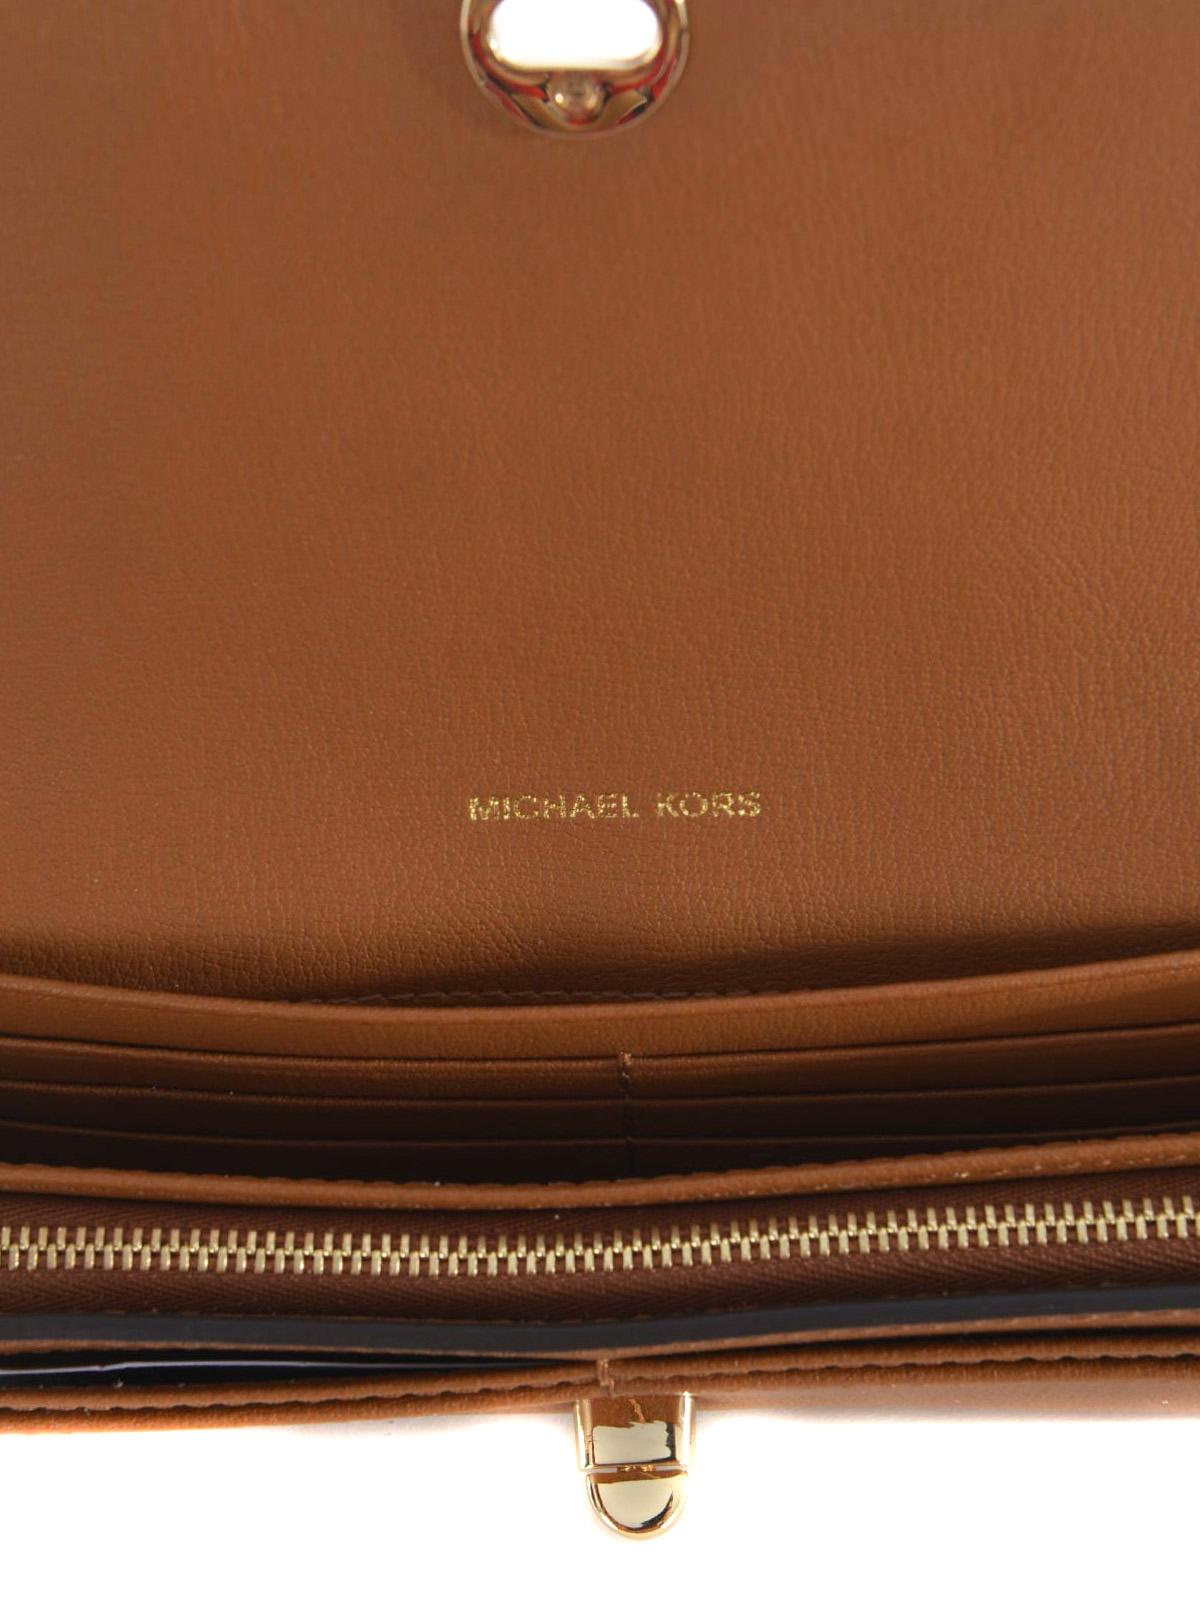 72ae8ea8d14f Michael Kors - Rivington Stud leather flap wallet - wallets & purses ...